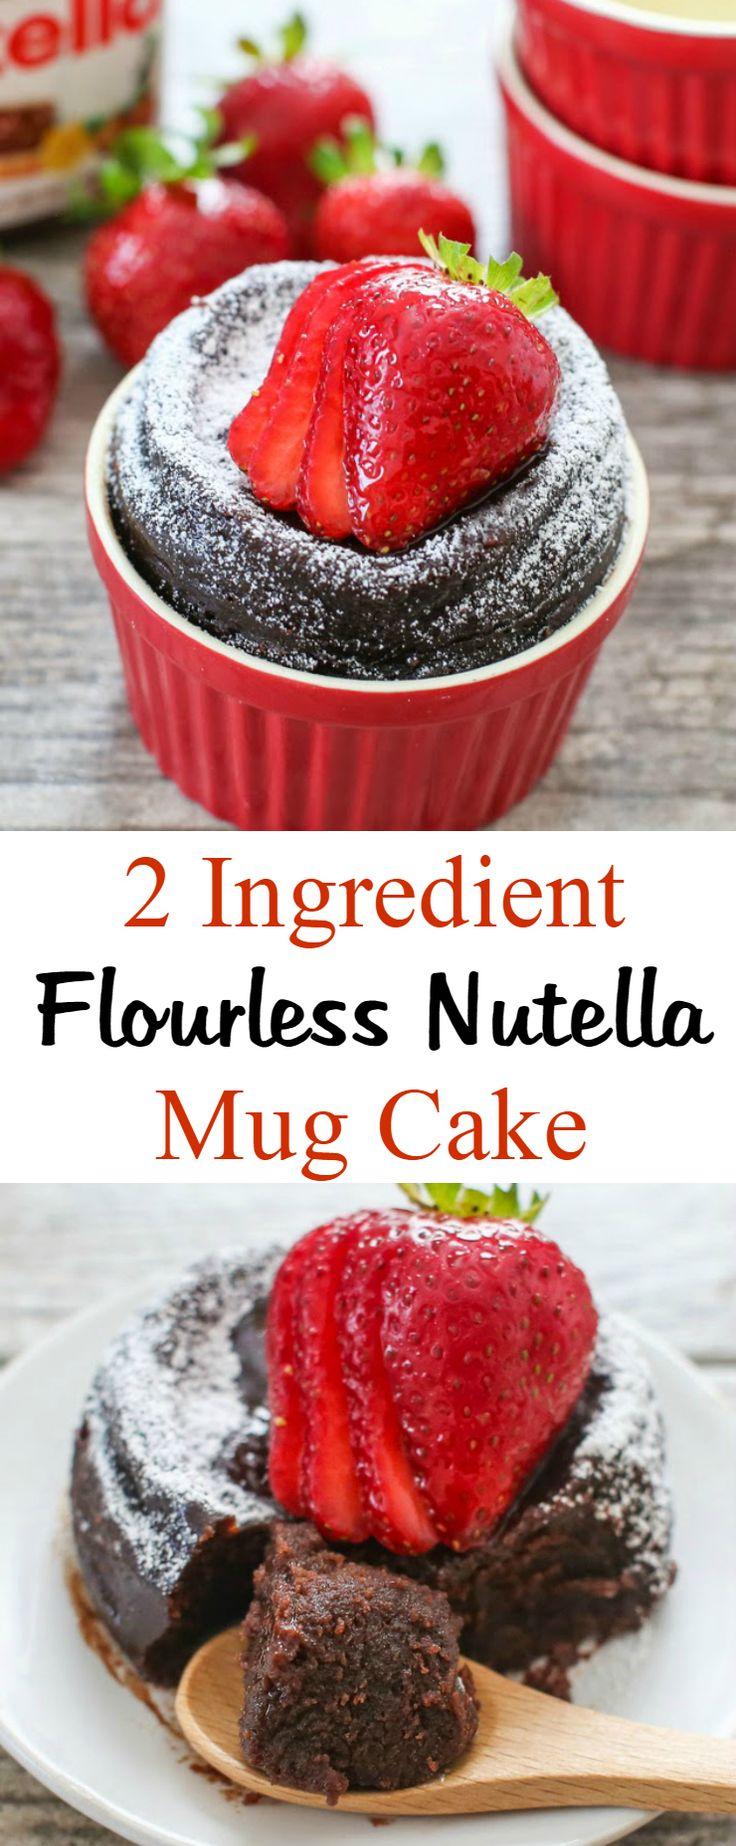 2 Ingredient Flourless Nutella Mug Cake. Prep time is less than 5 minutes!